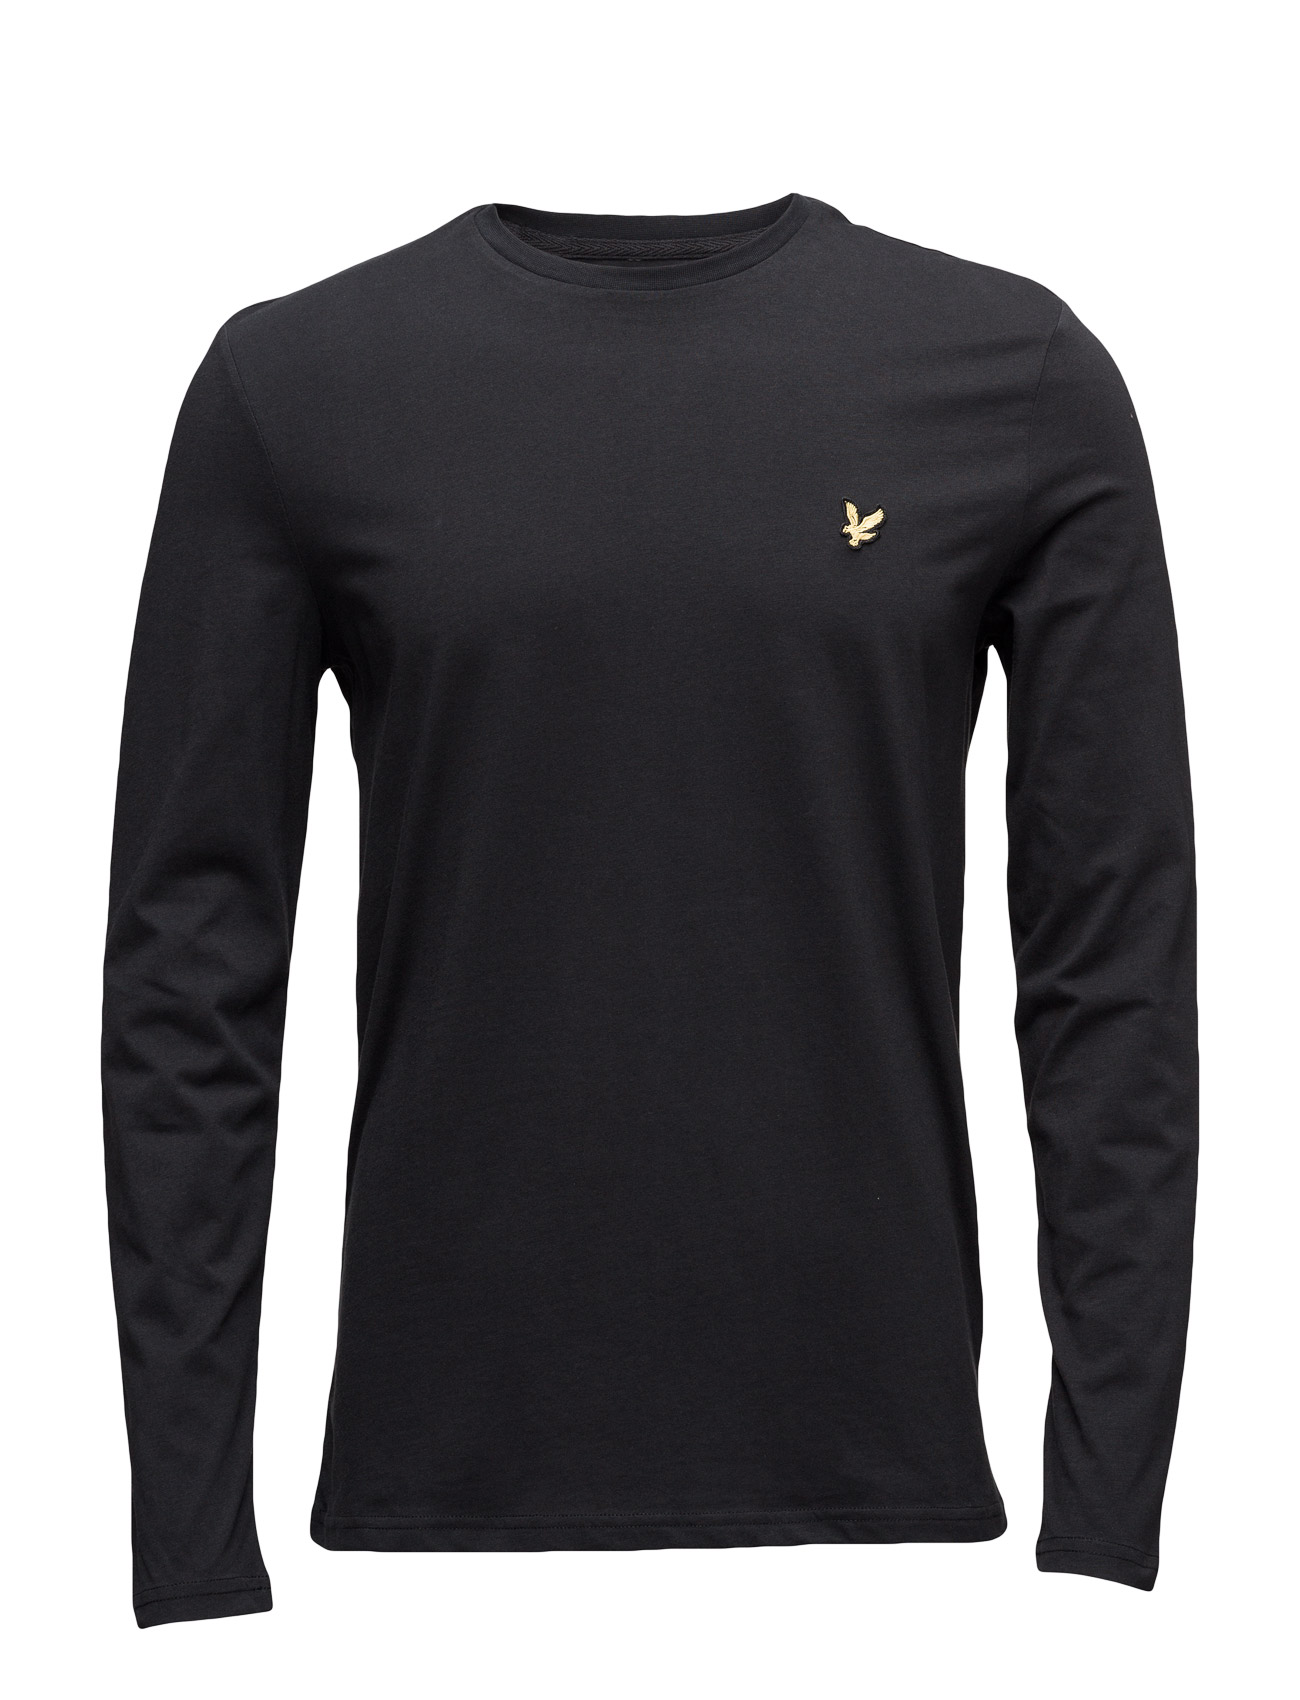 2b0e12e6 Ls Crew Neck T-shirt (True Black) (£35) - Lyle & Scott - T-Shirts ...